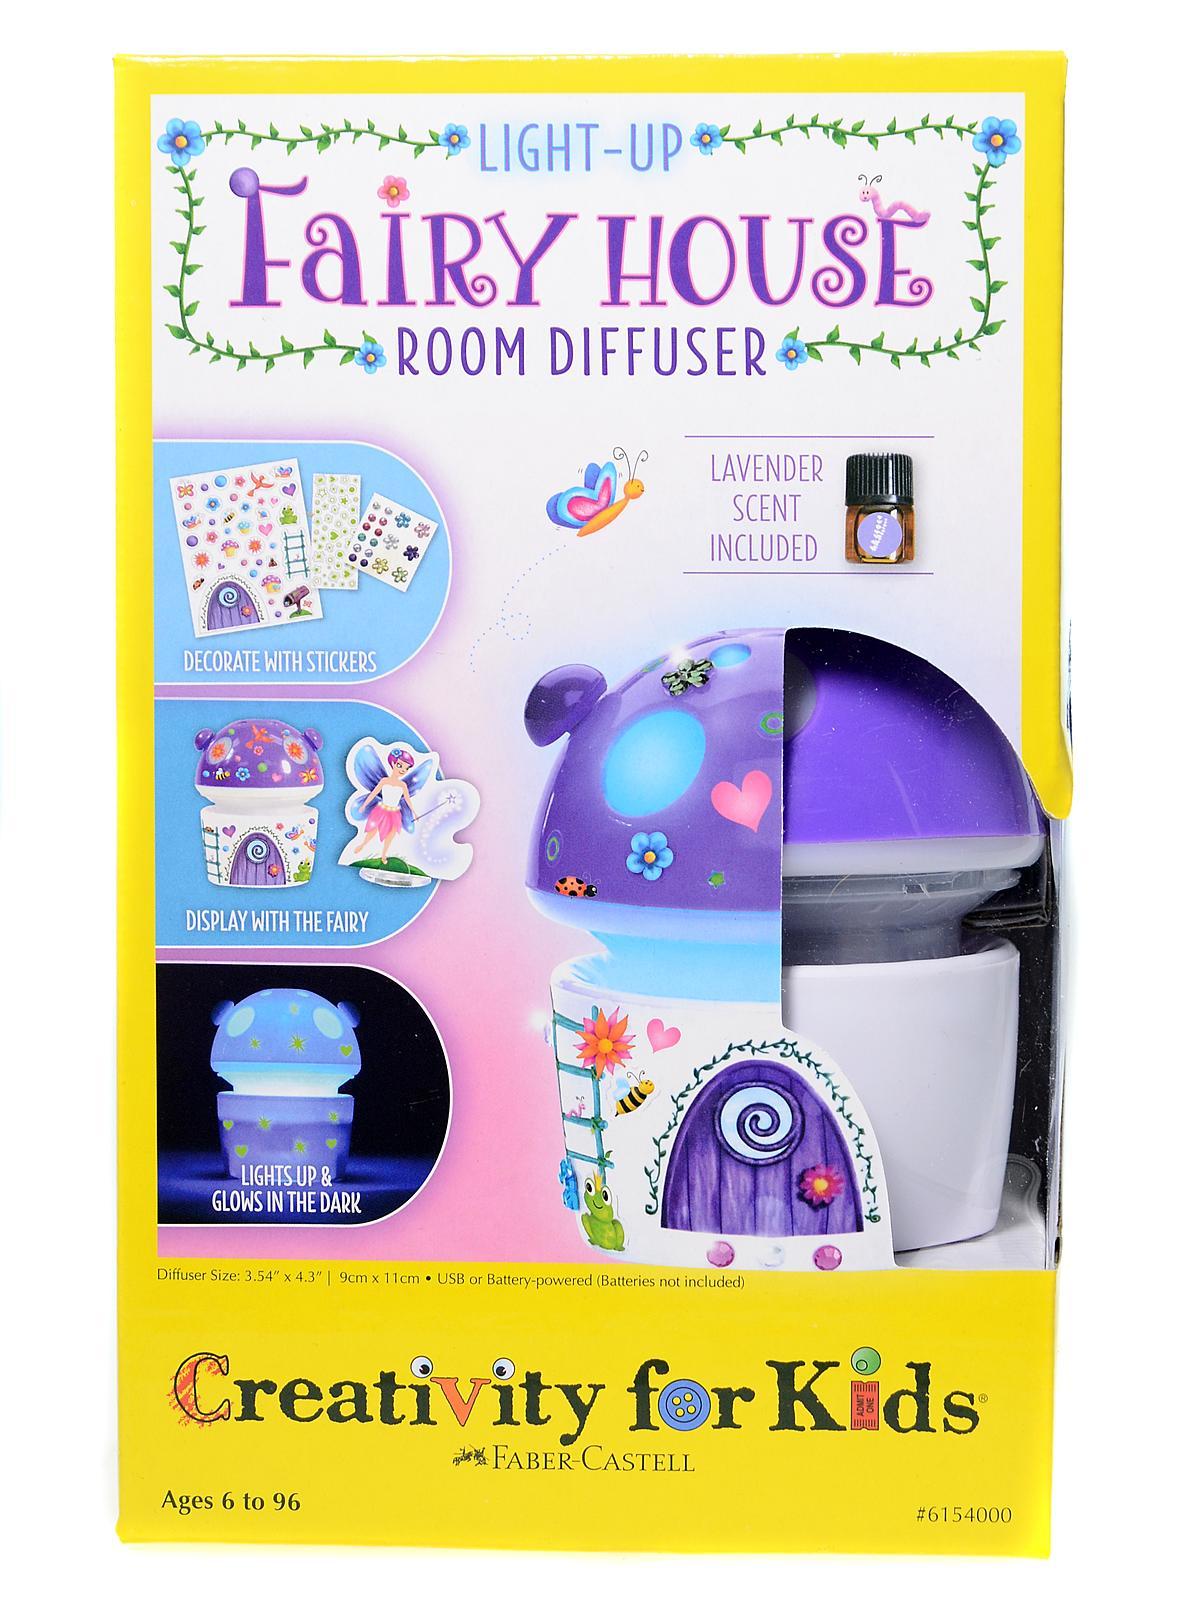 Creativity For Kids Fairy House Room Diffuser